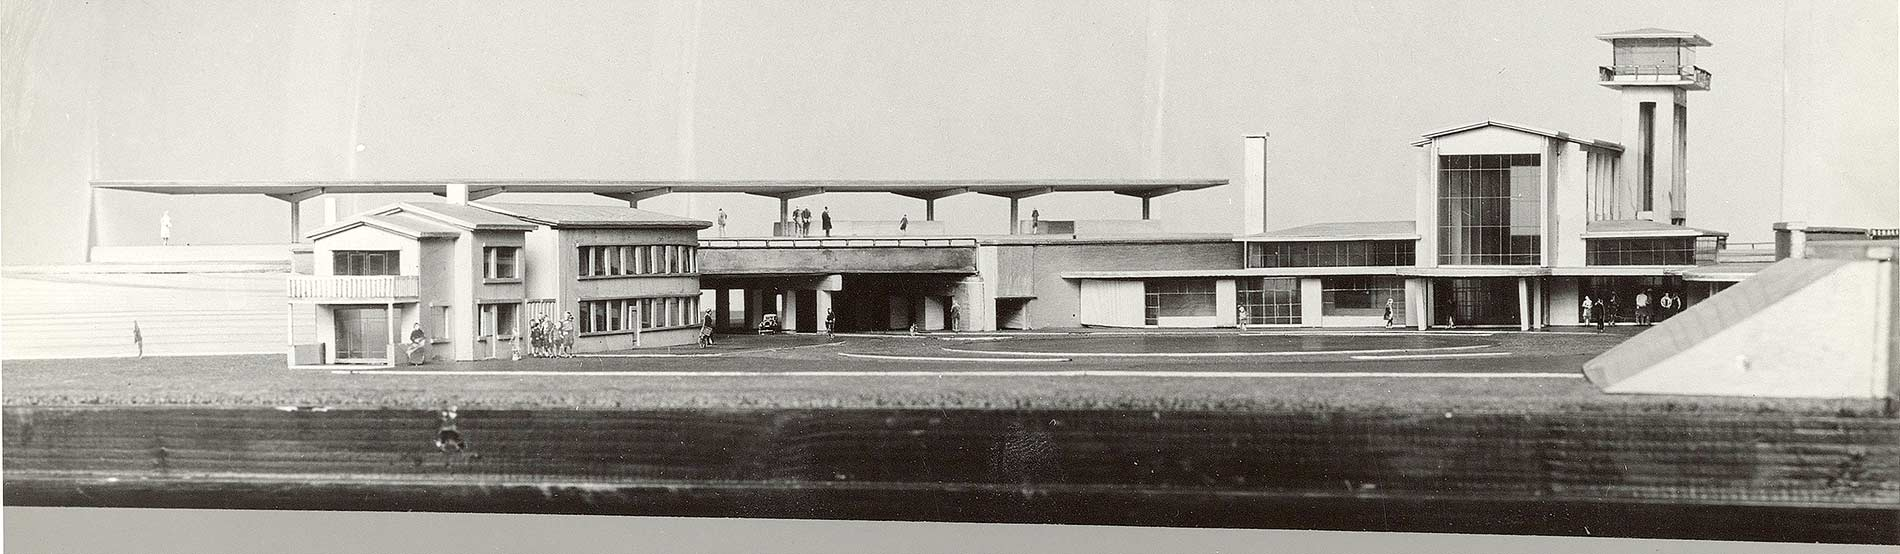 Maquette Muiderpoortstation